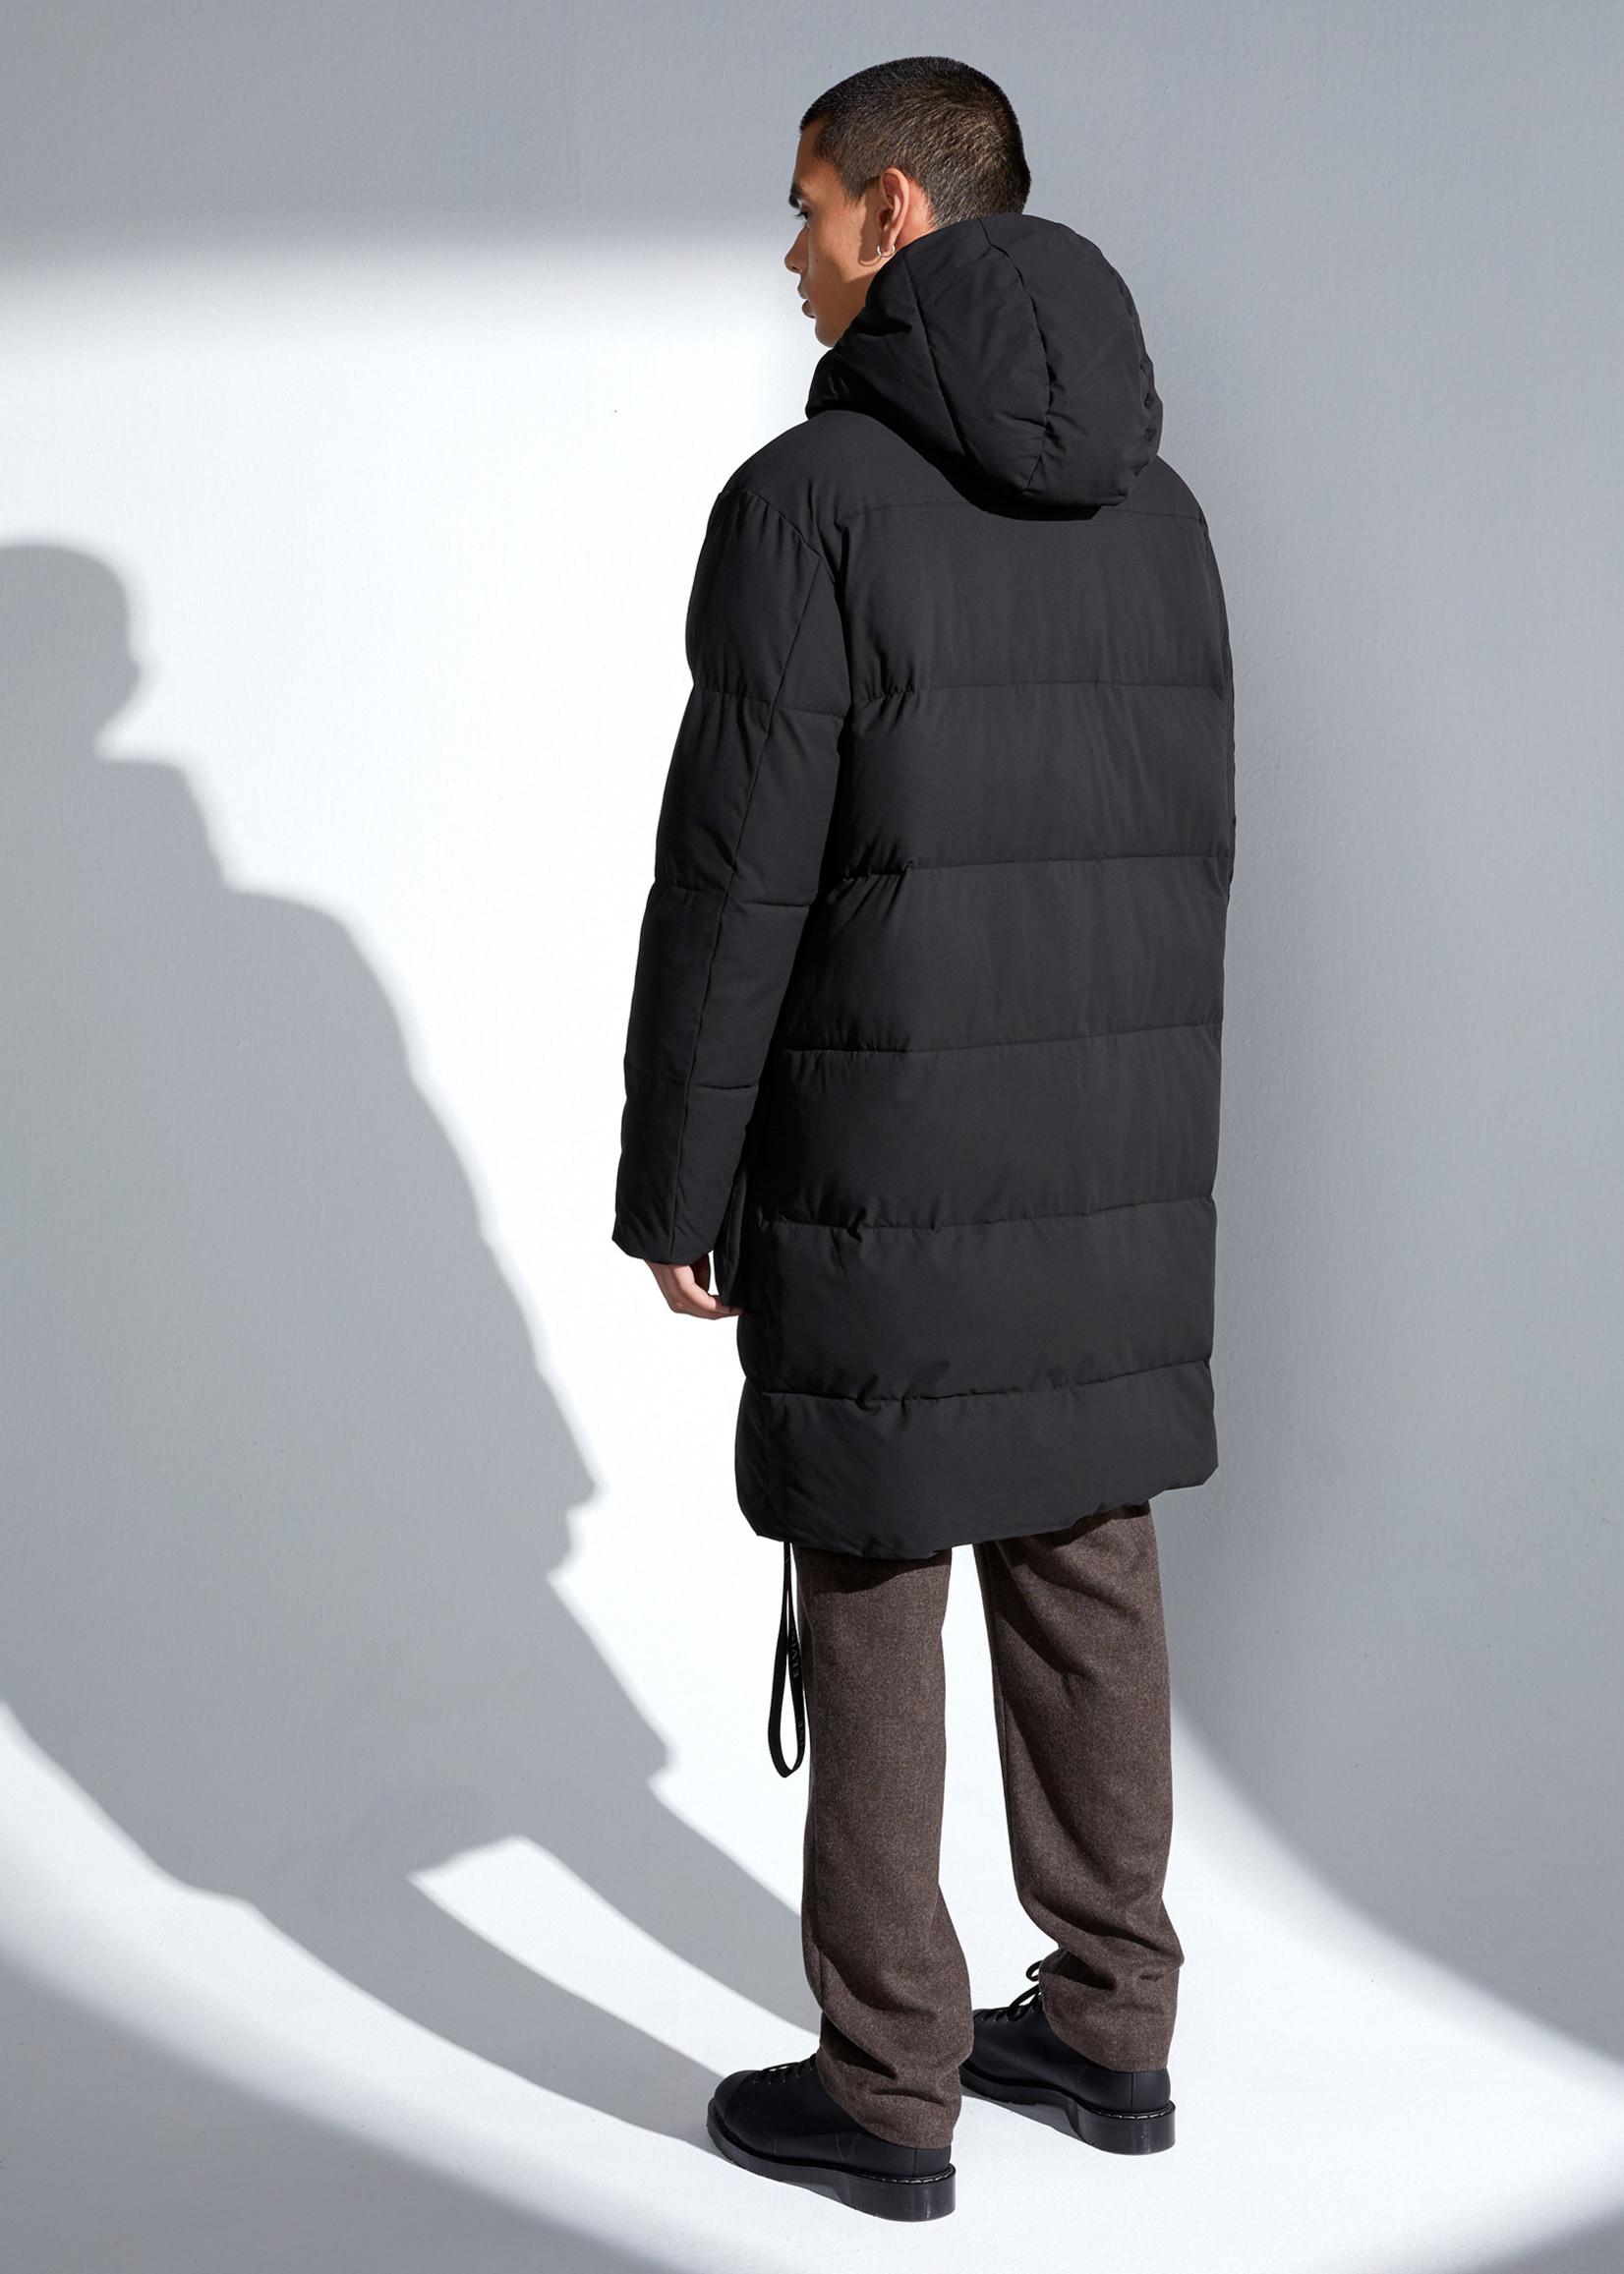 Elvine Abel Jacket